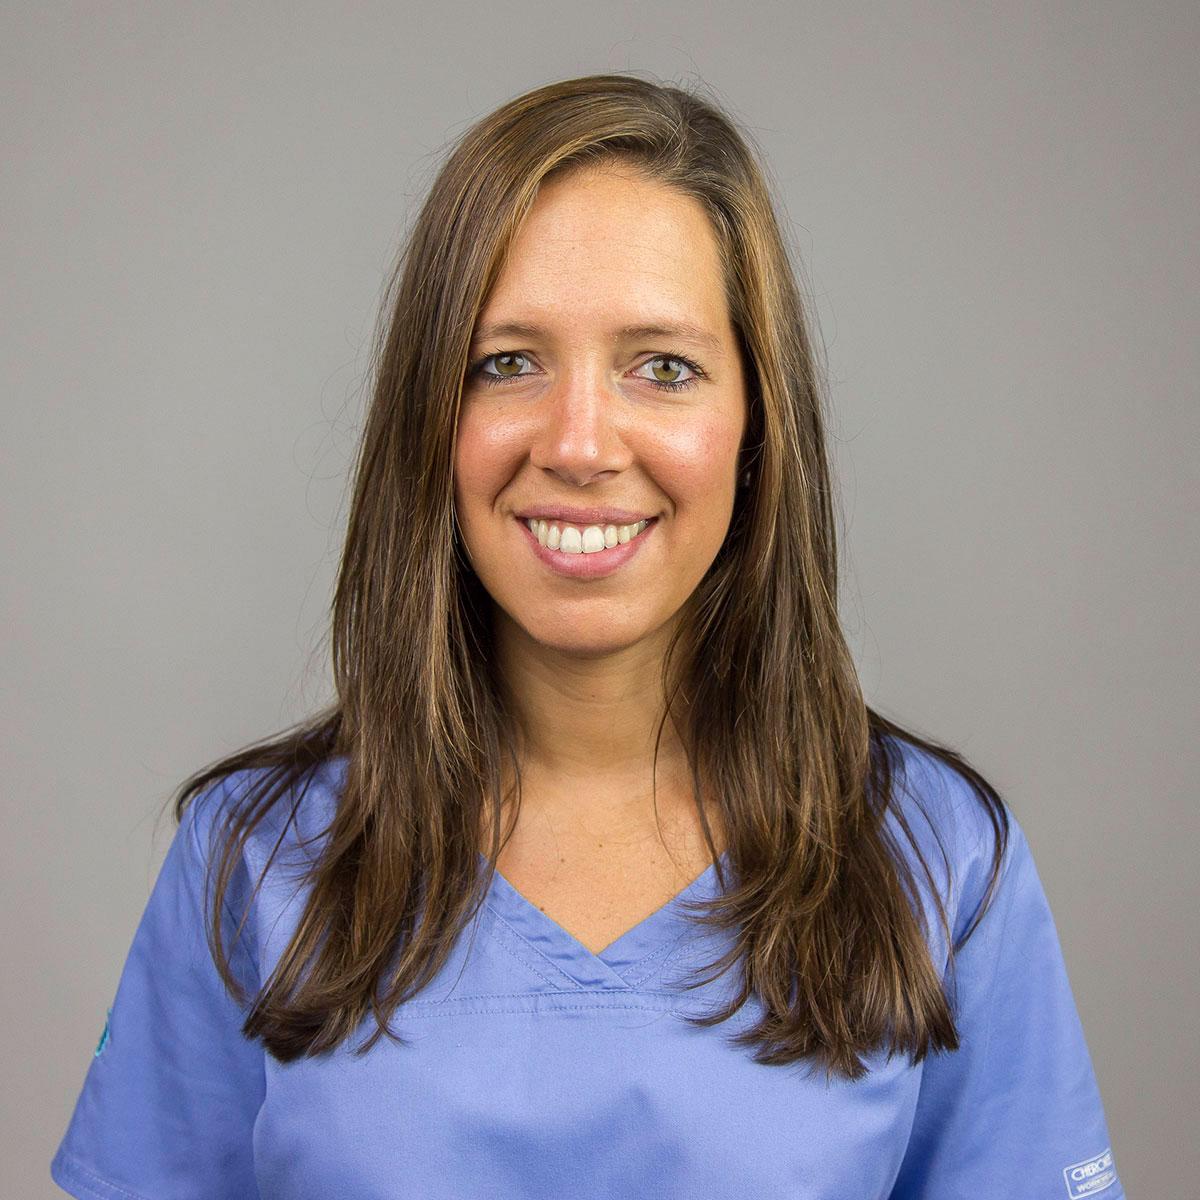 MONTSE ROBIRÓ - Odontologia general - Odontopediatra